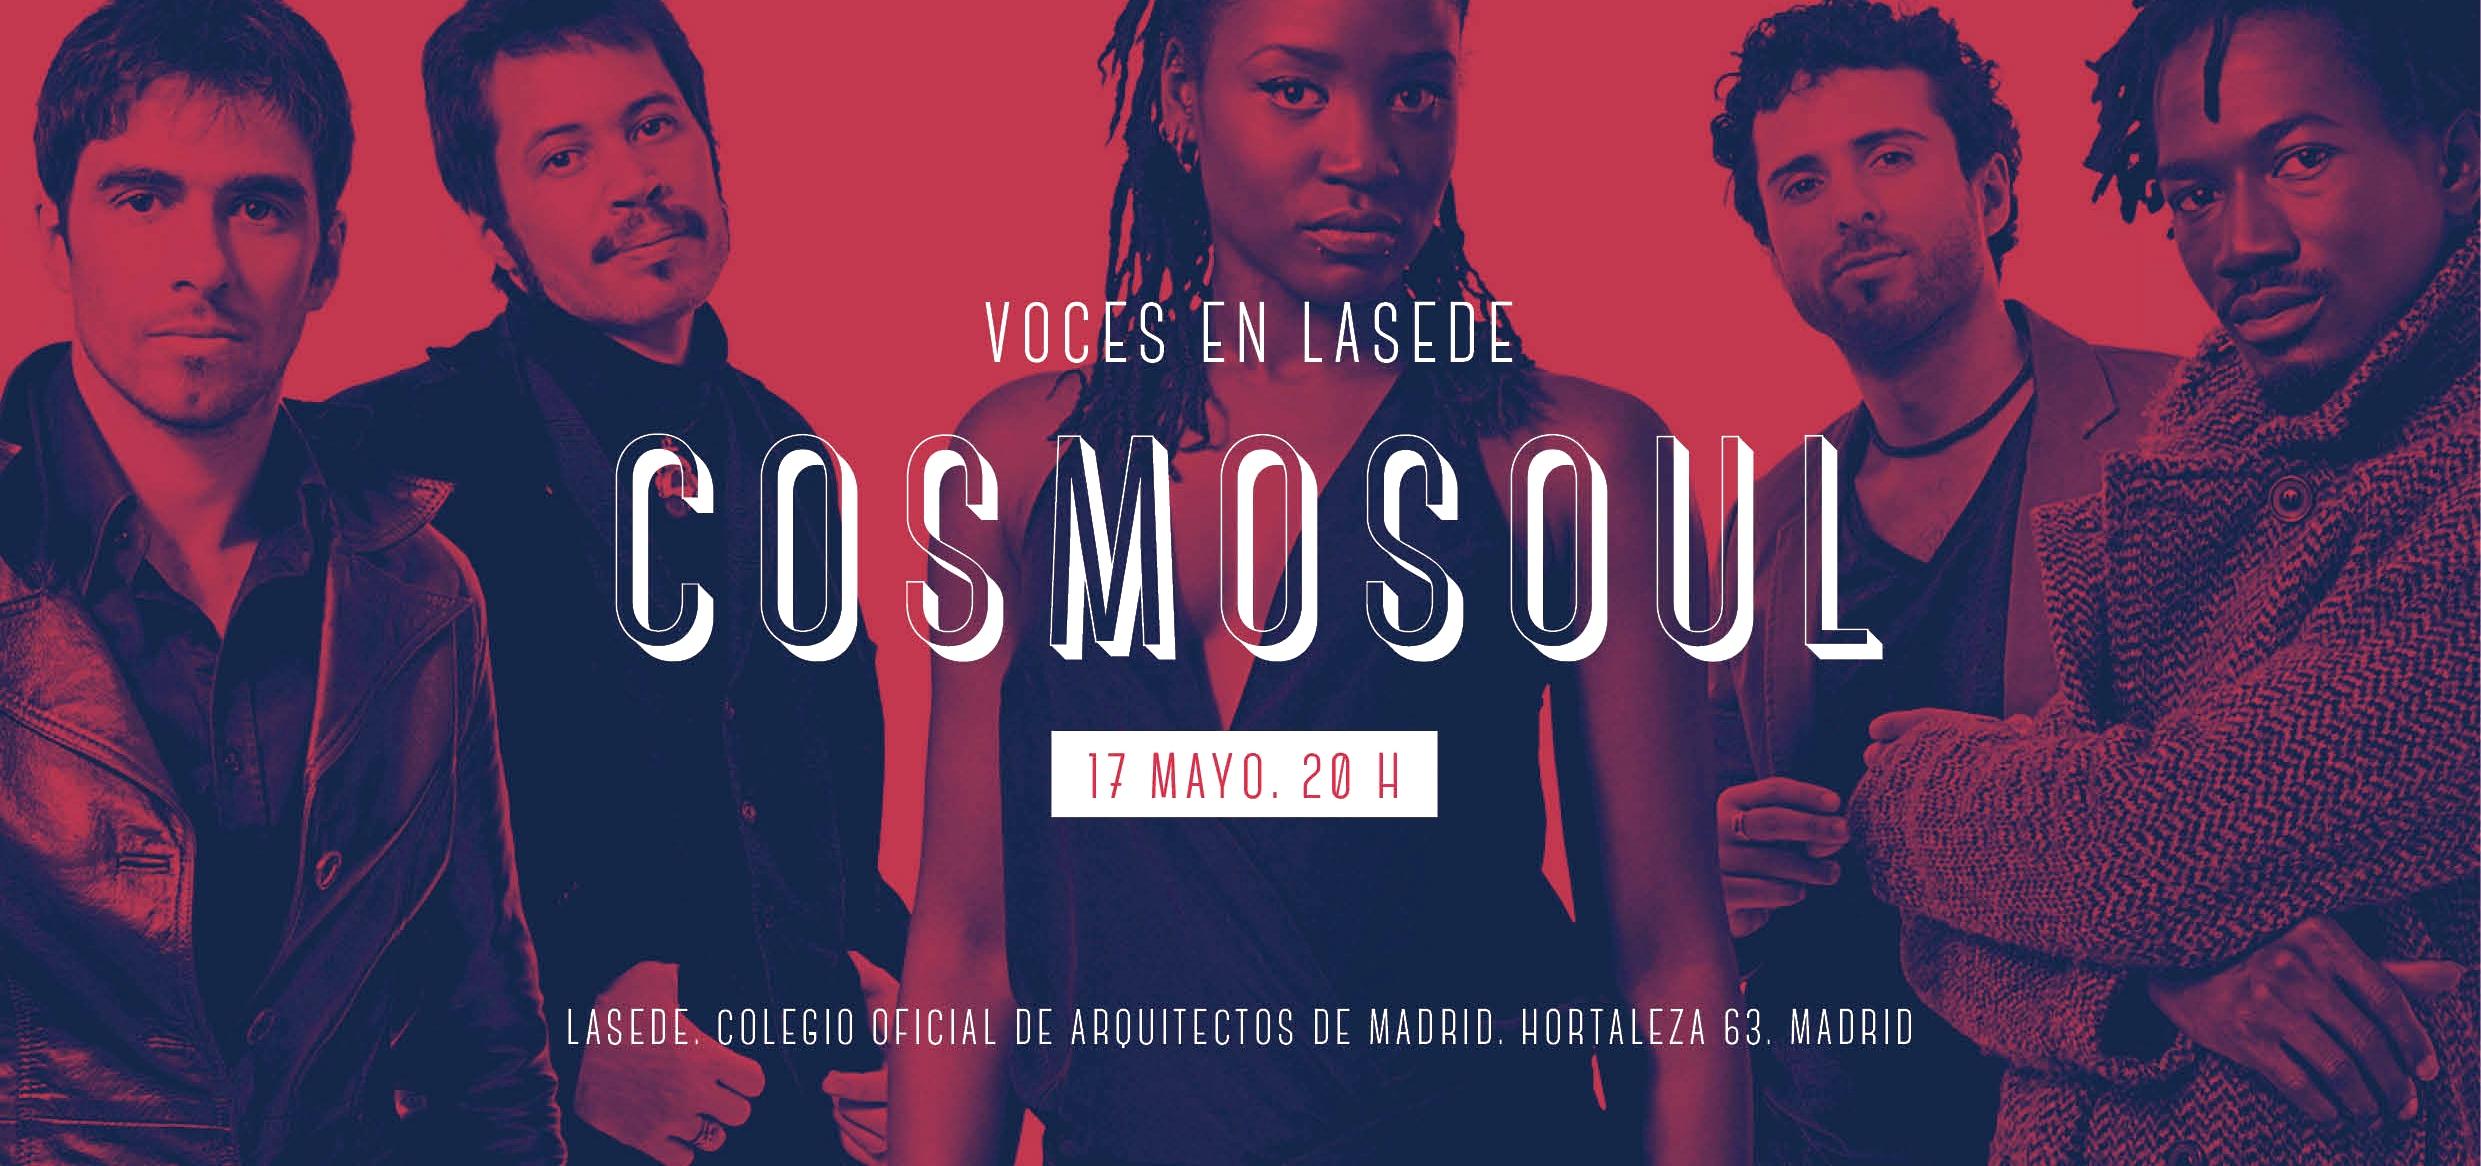 Banner CosmoSoul VeS